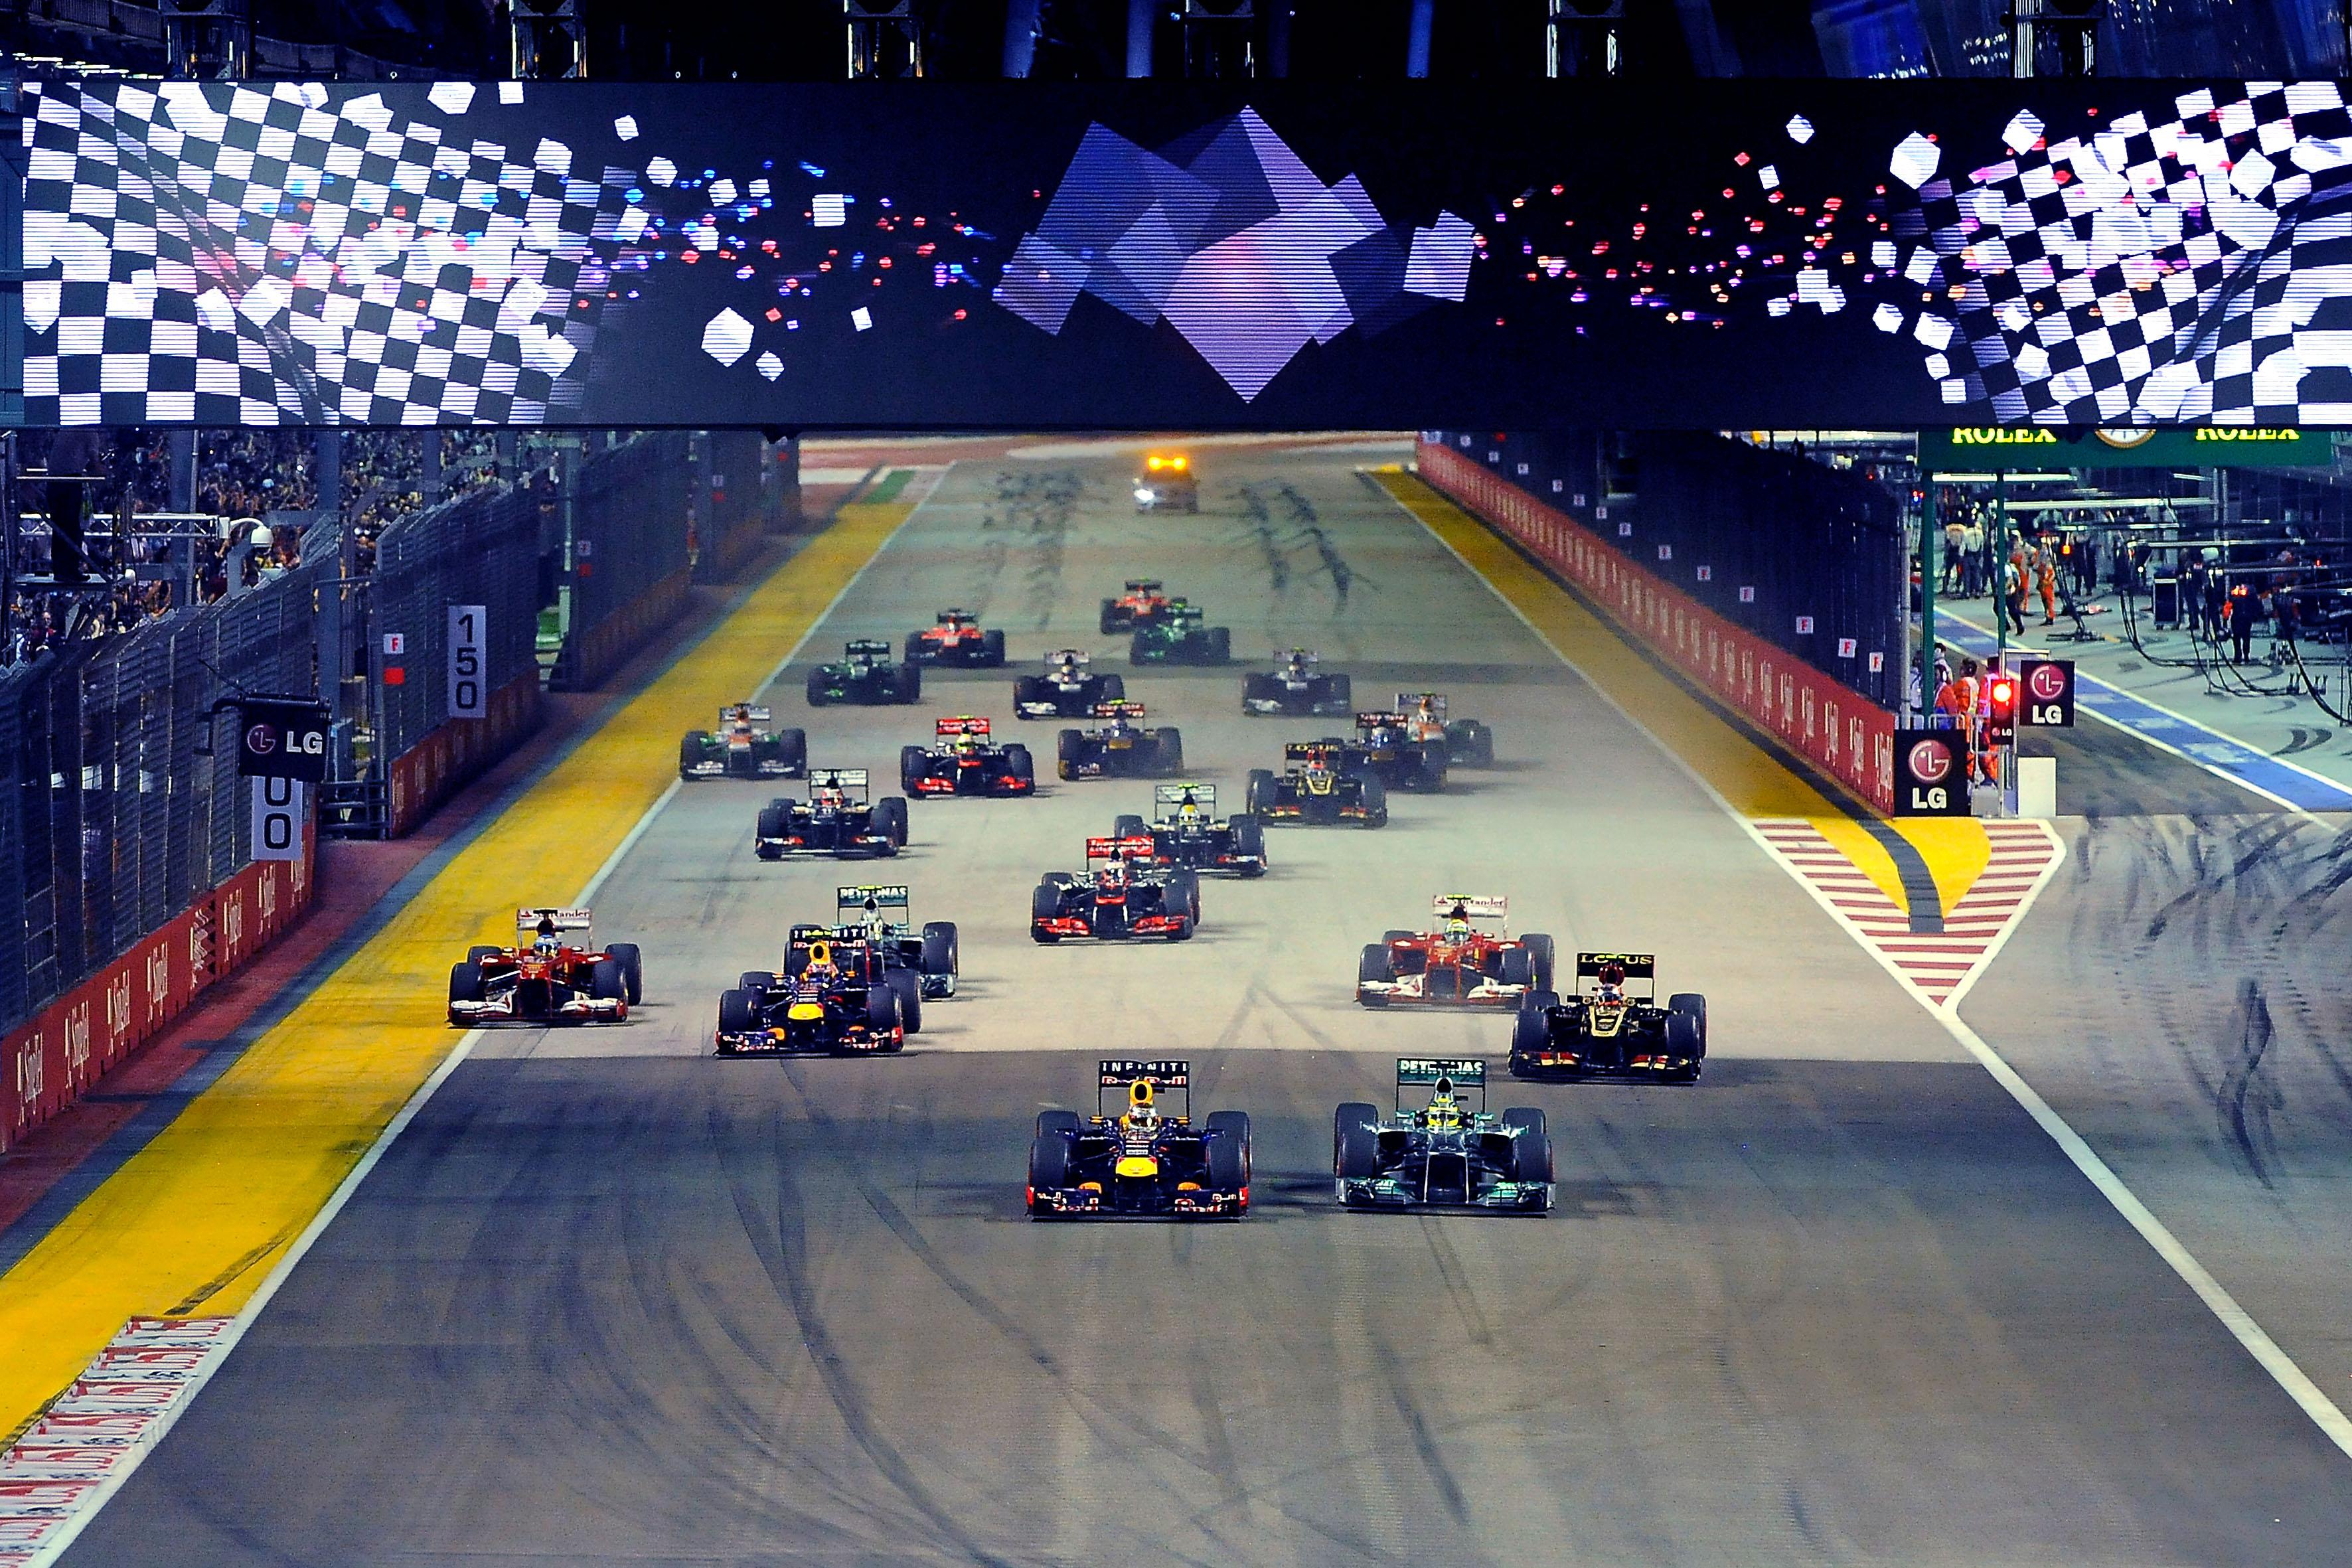 Circuito Singapur : Gran premio de singapur u2013 motormundial